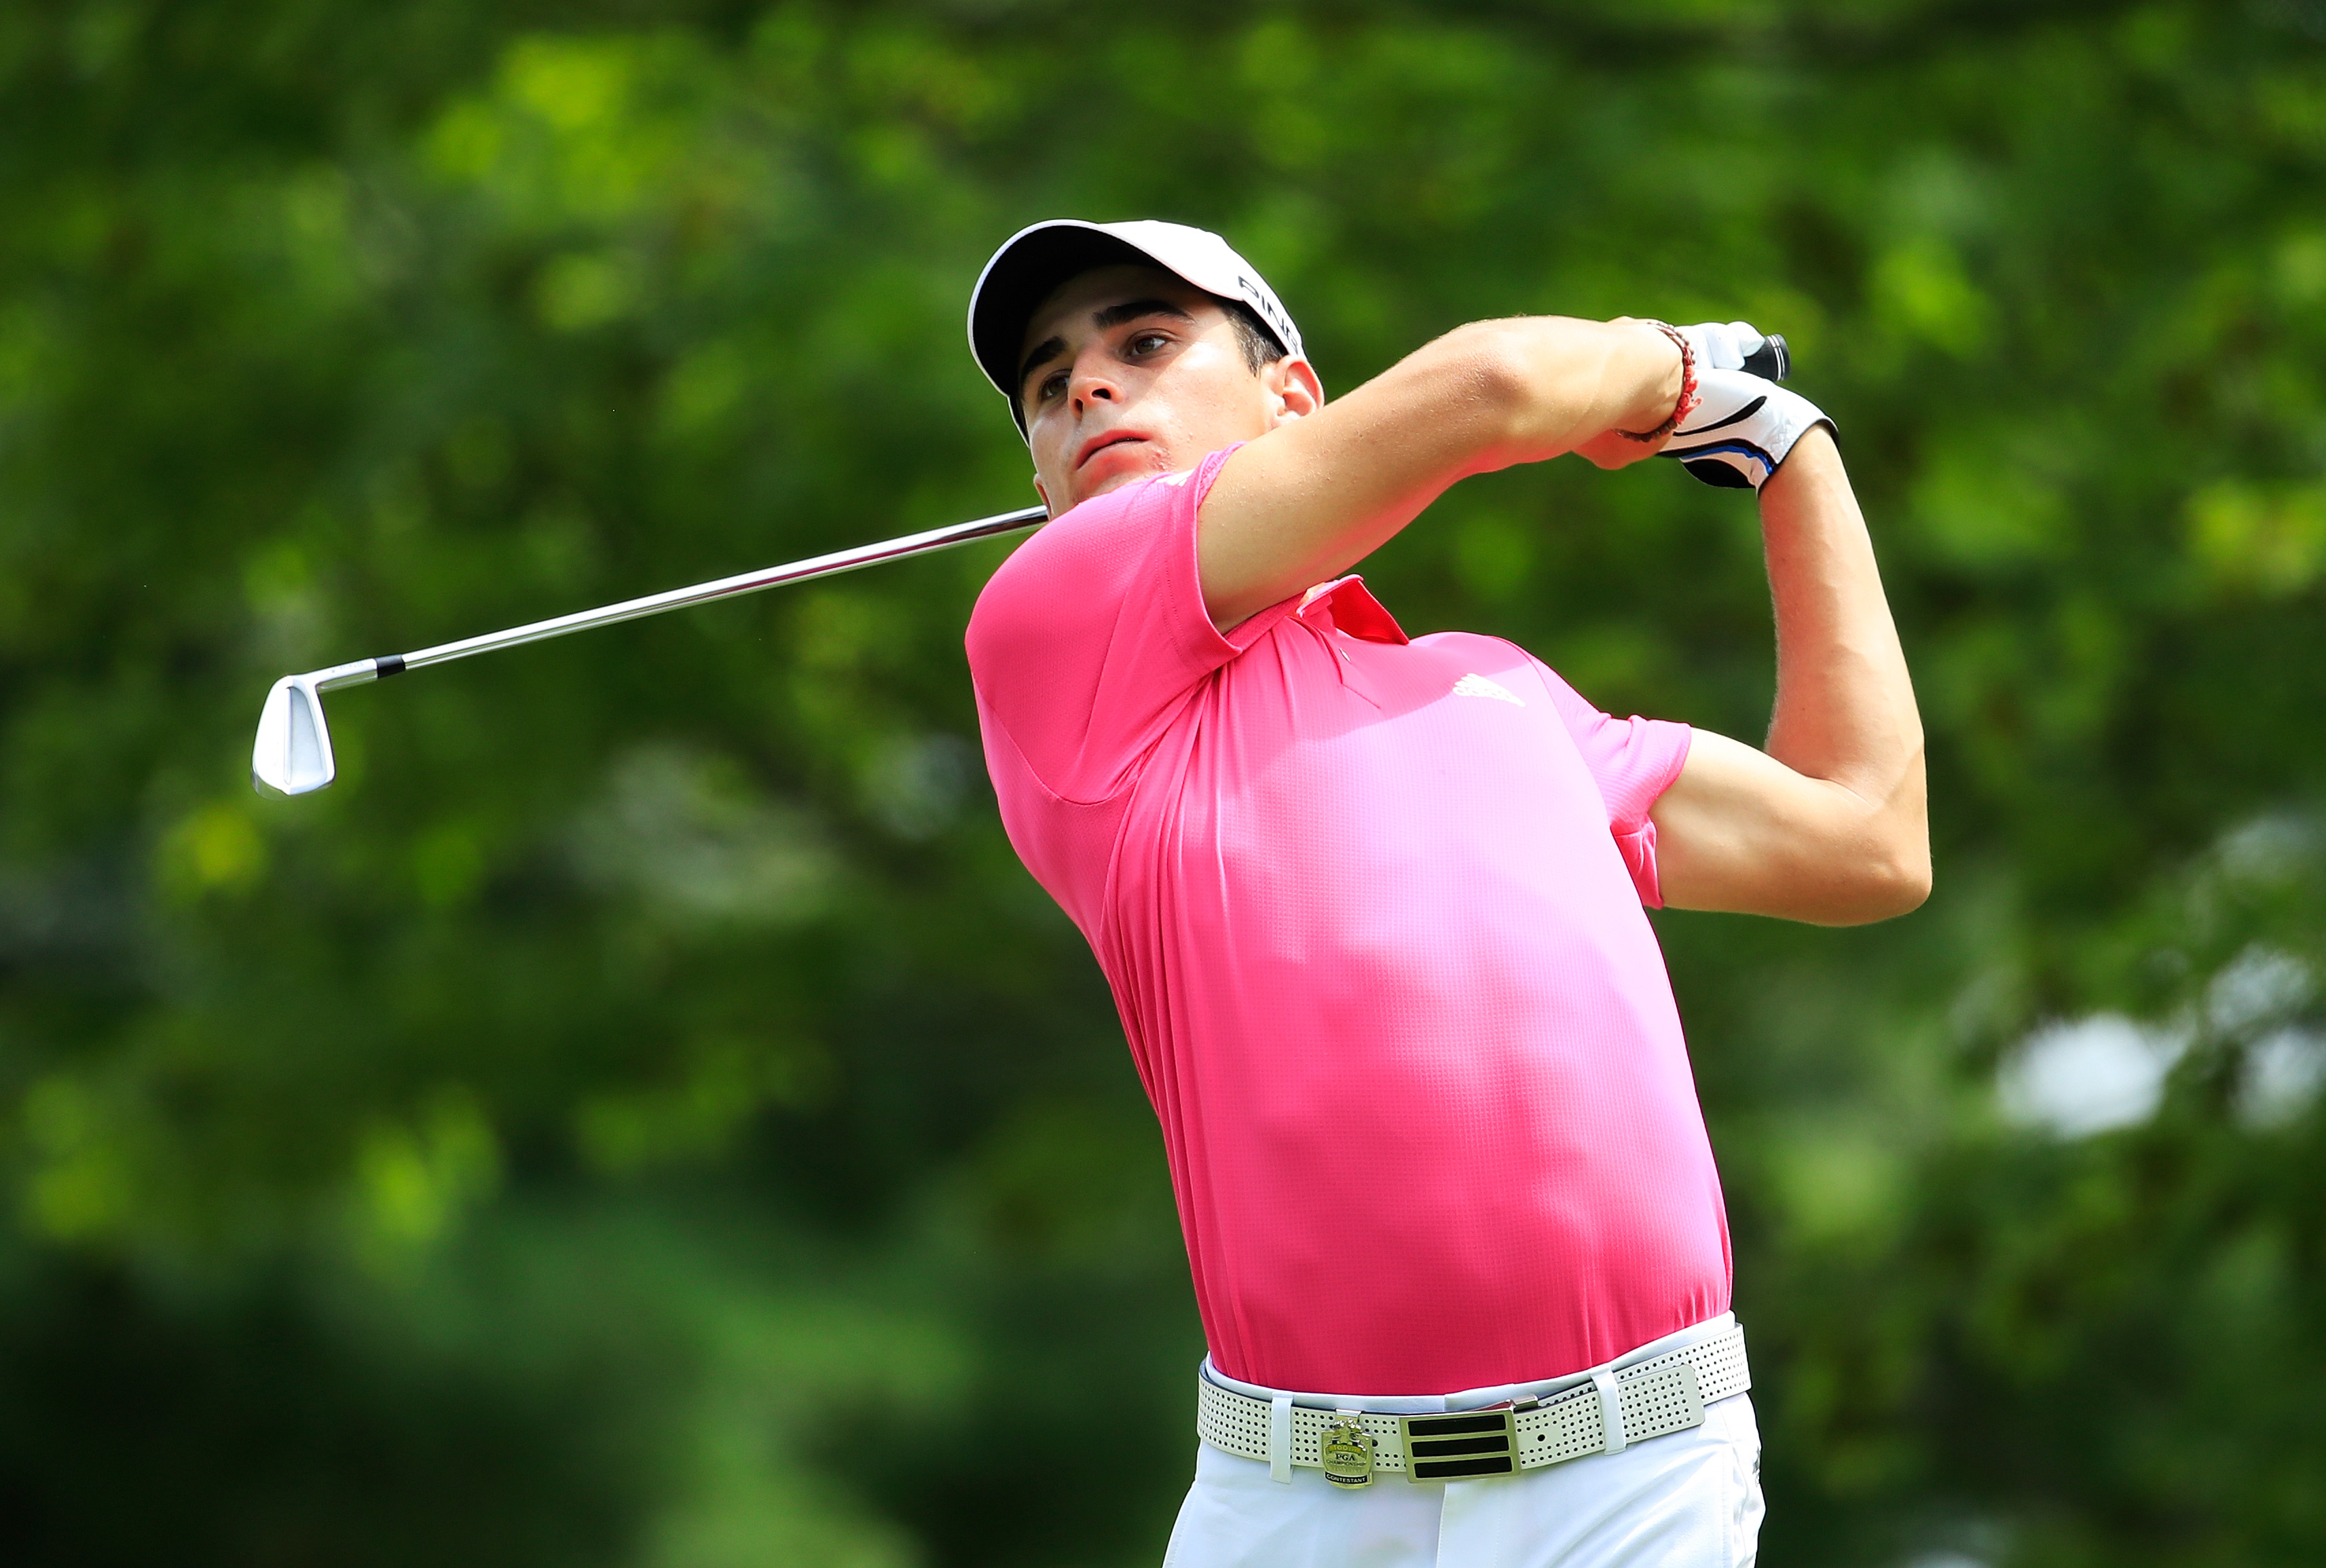 PGA Championship: A 19-year-old is already among the game's best. Meet  Joaquin Niemann | Golf World | Golf Digest